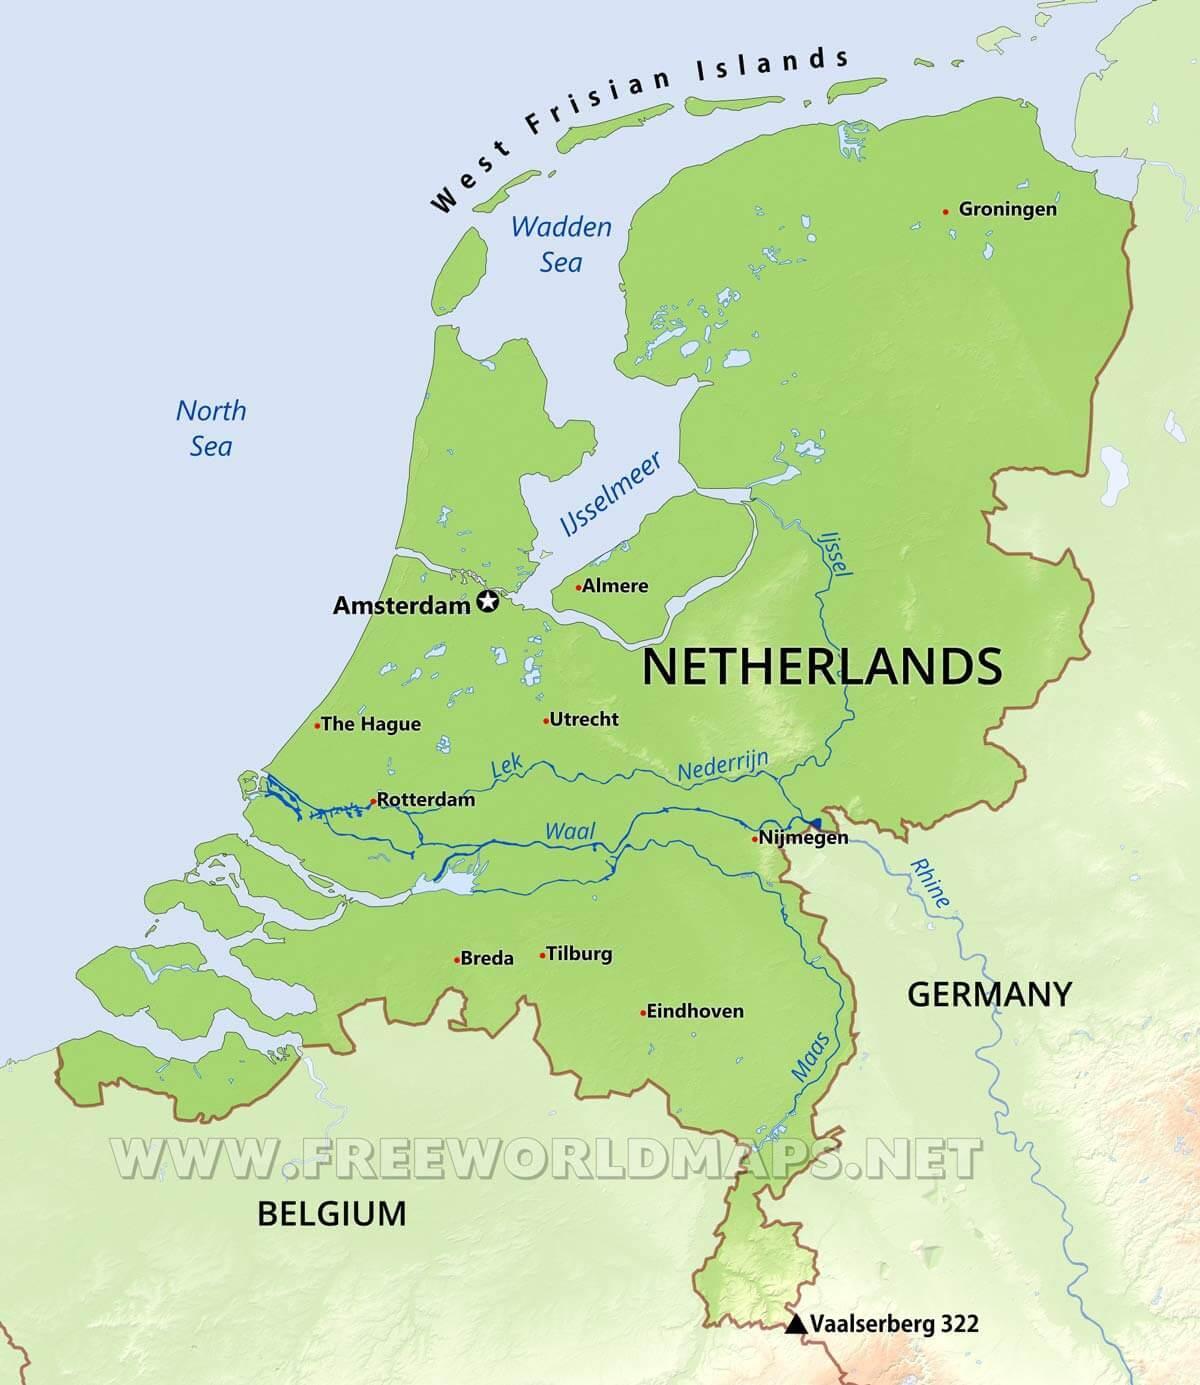 nederland kart Nederland fysisk kart   Fysisk kart over Nederland (Vest Europa  nederland kart